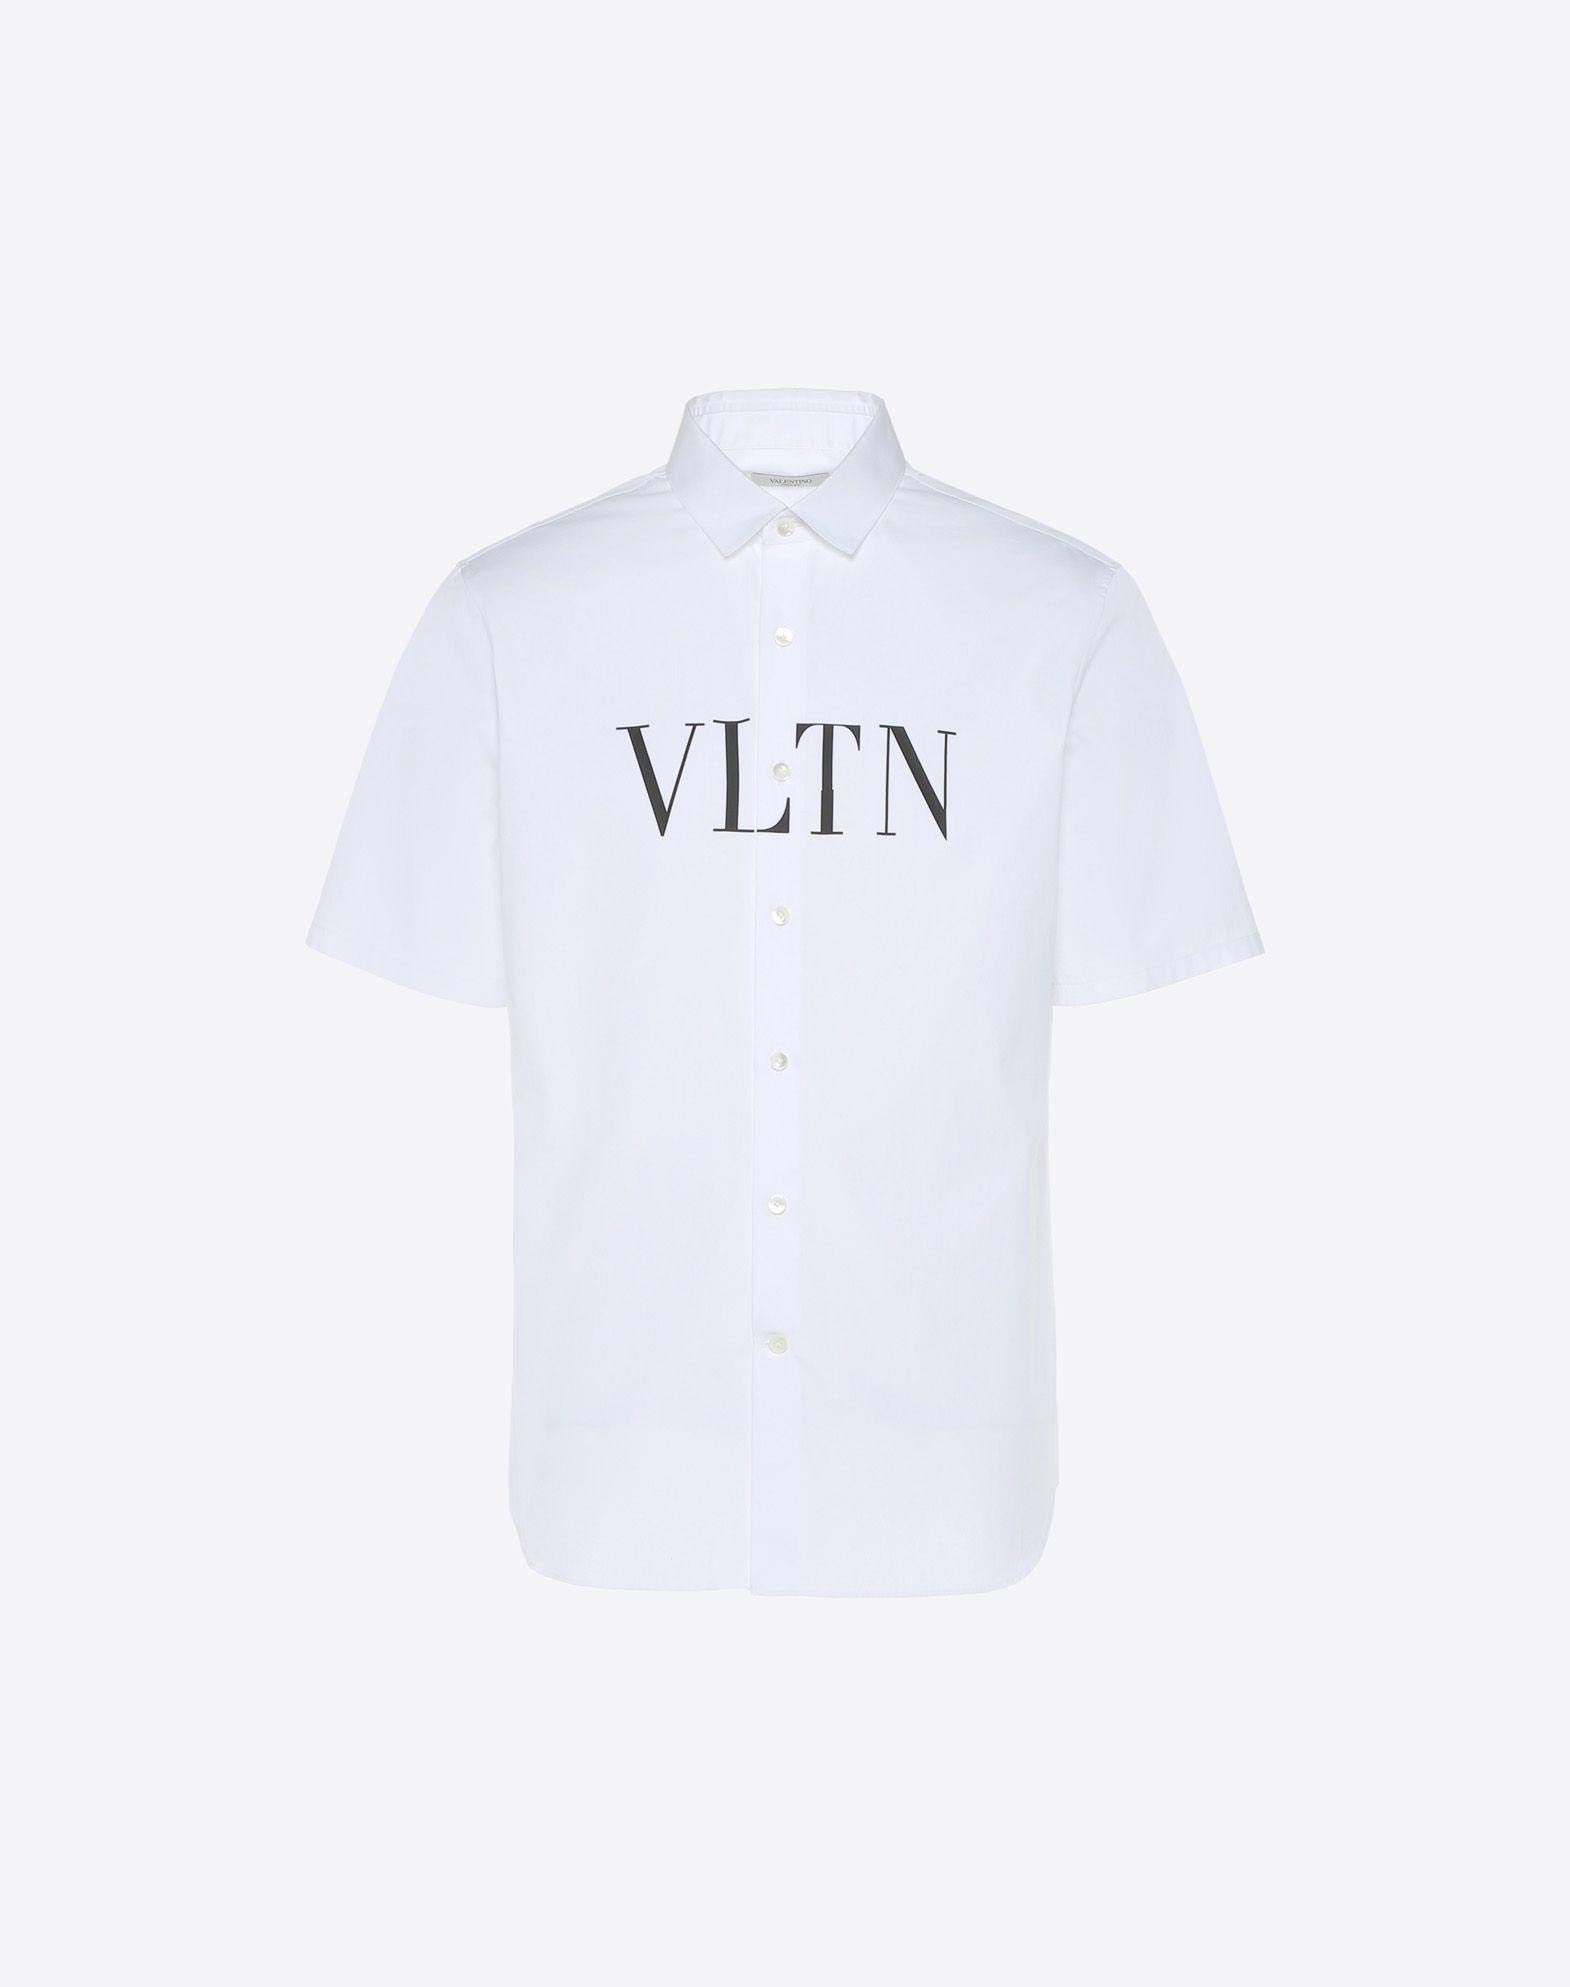 VALENTINO Printed logo Classic Neckline Button closing Poplin  12143134vv